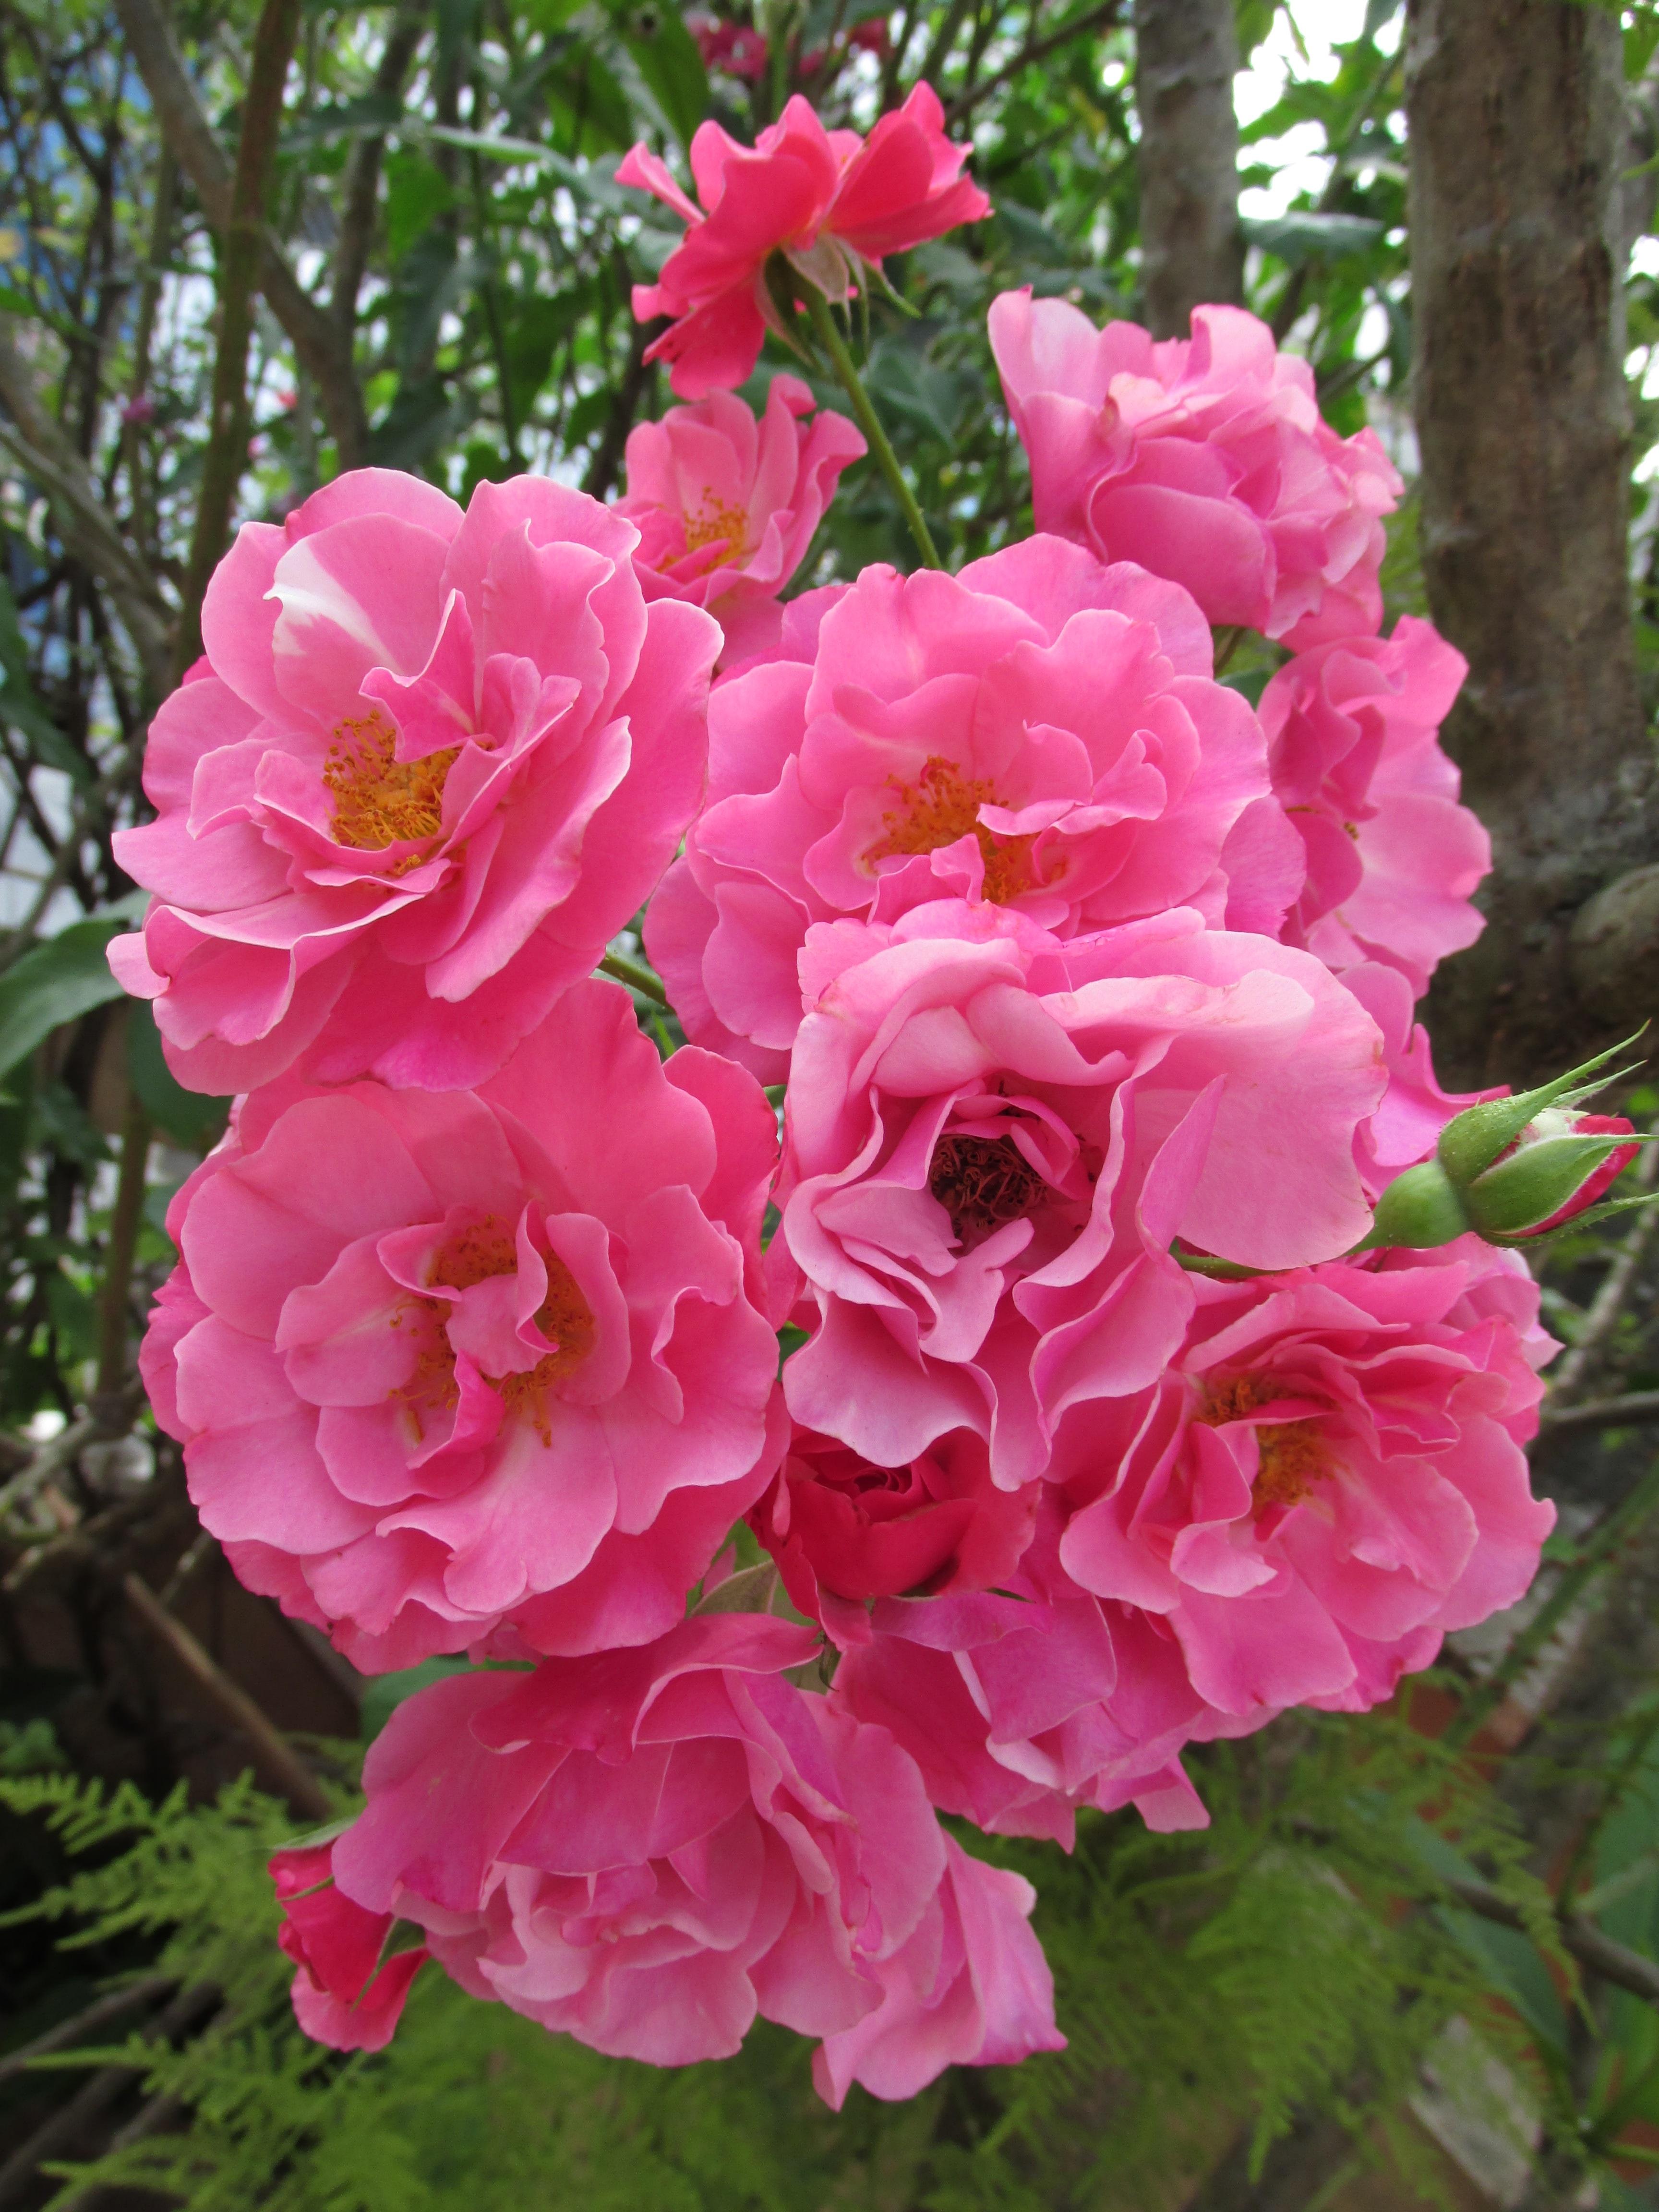 Free fotobanka kv t okv tn l stek jaro zelen - Fleurs roses de printemps ...